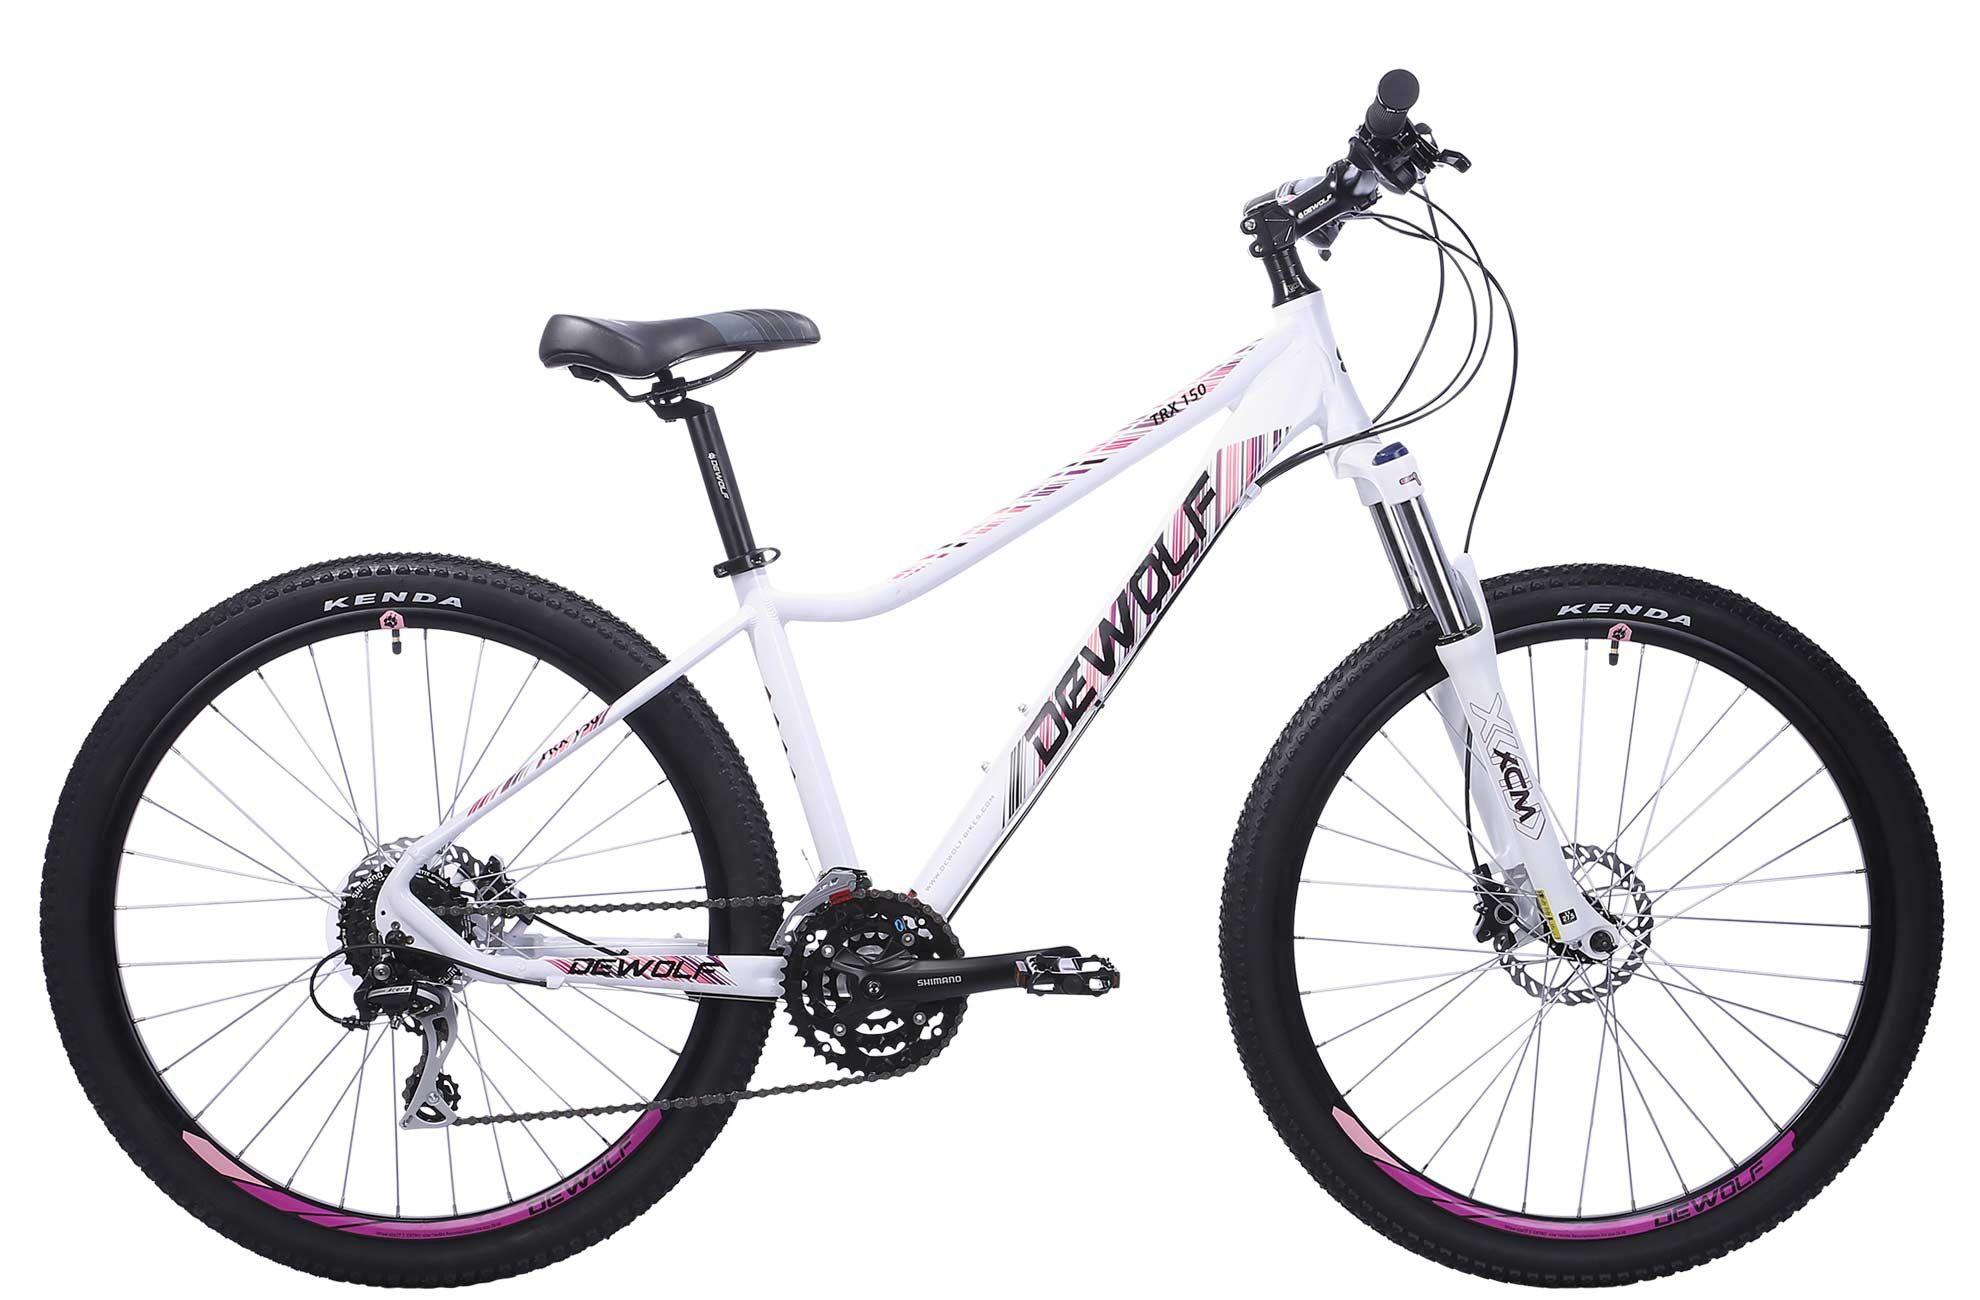 Велосипед Dewolf TRX 150 2016 велосипед dewolf trx 150 2017